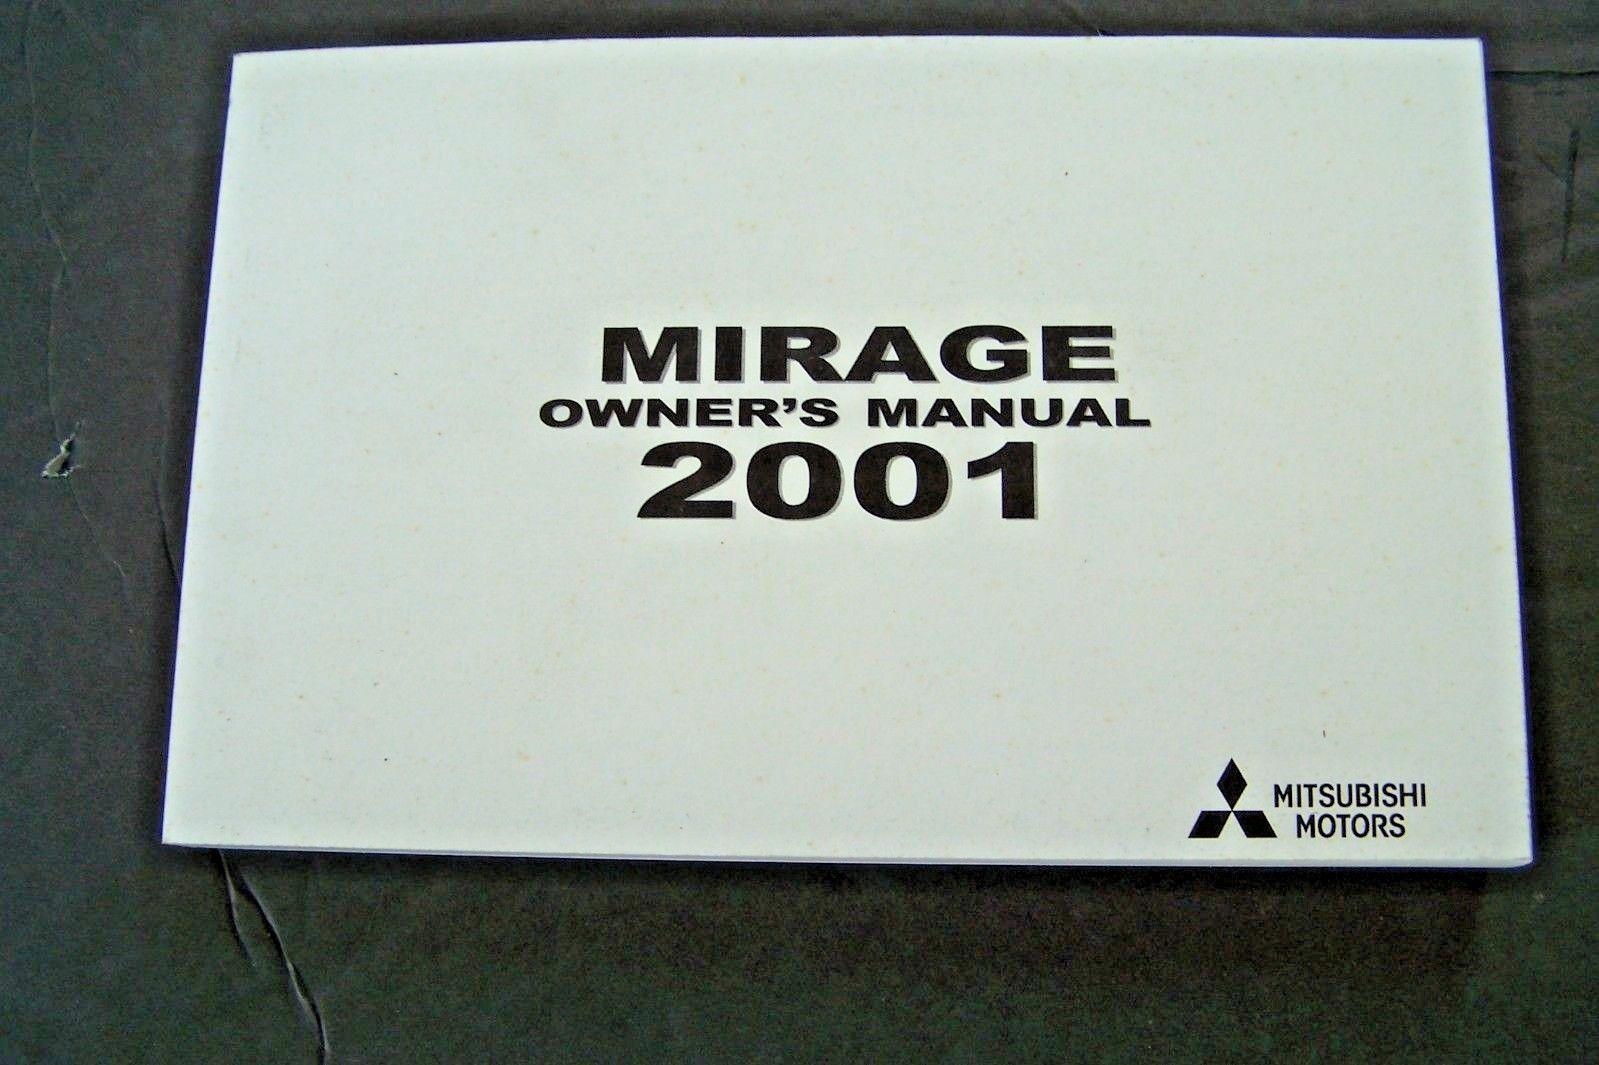 2001 Mitsubishi Mirage  Owner's Manual new factory reprint